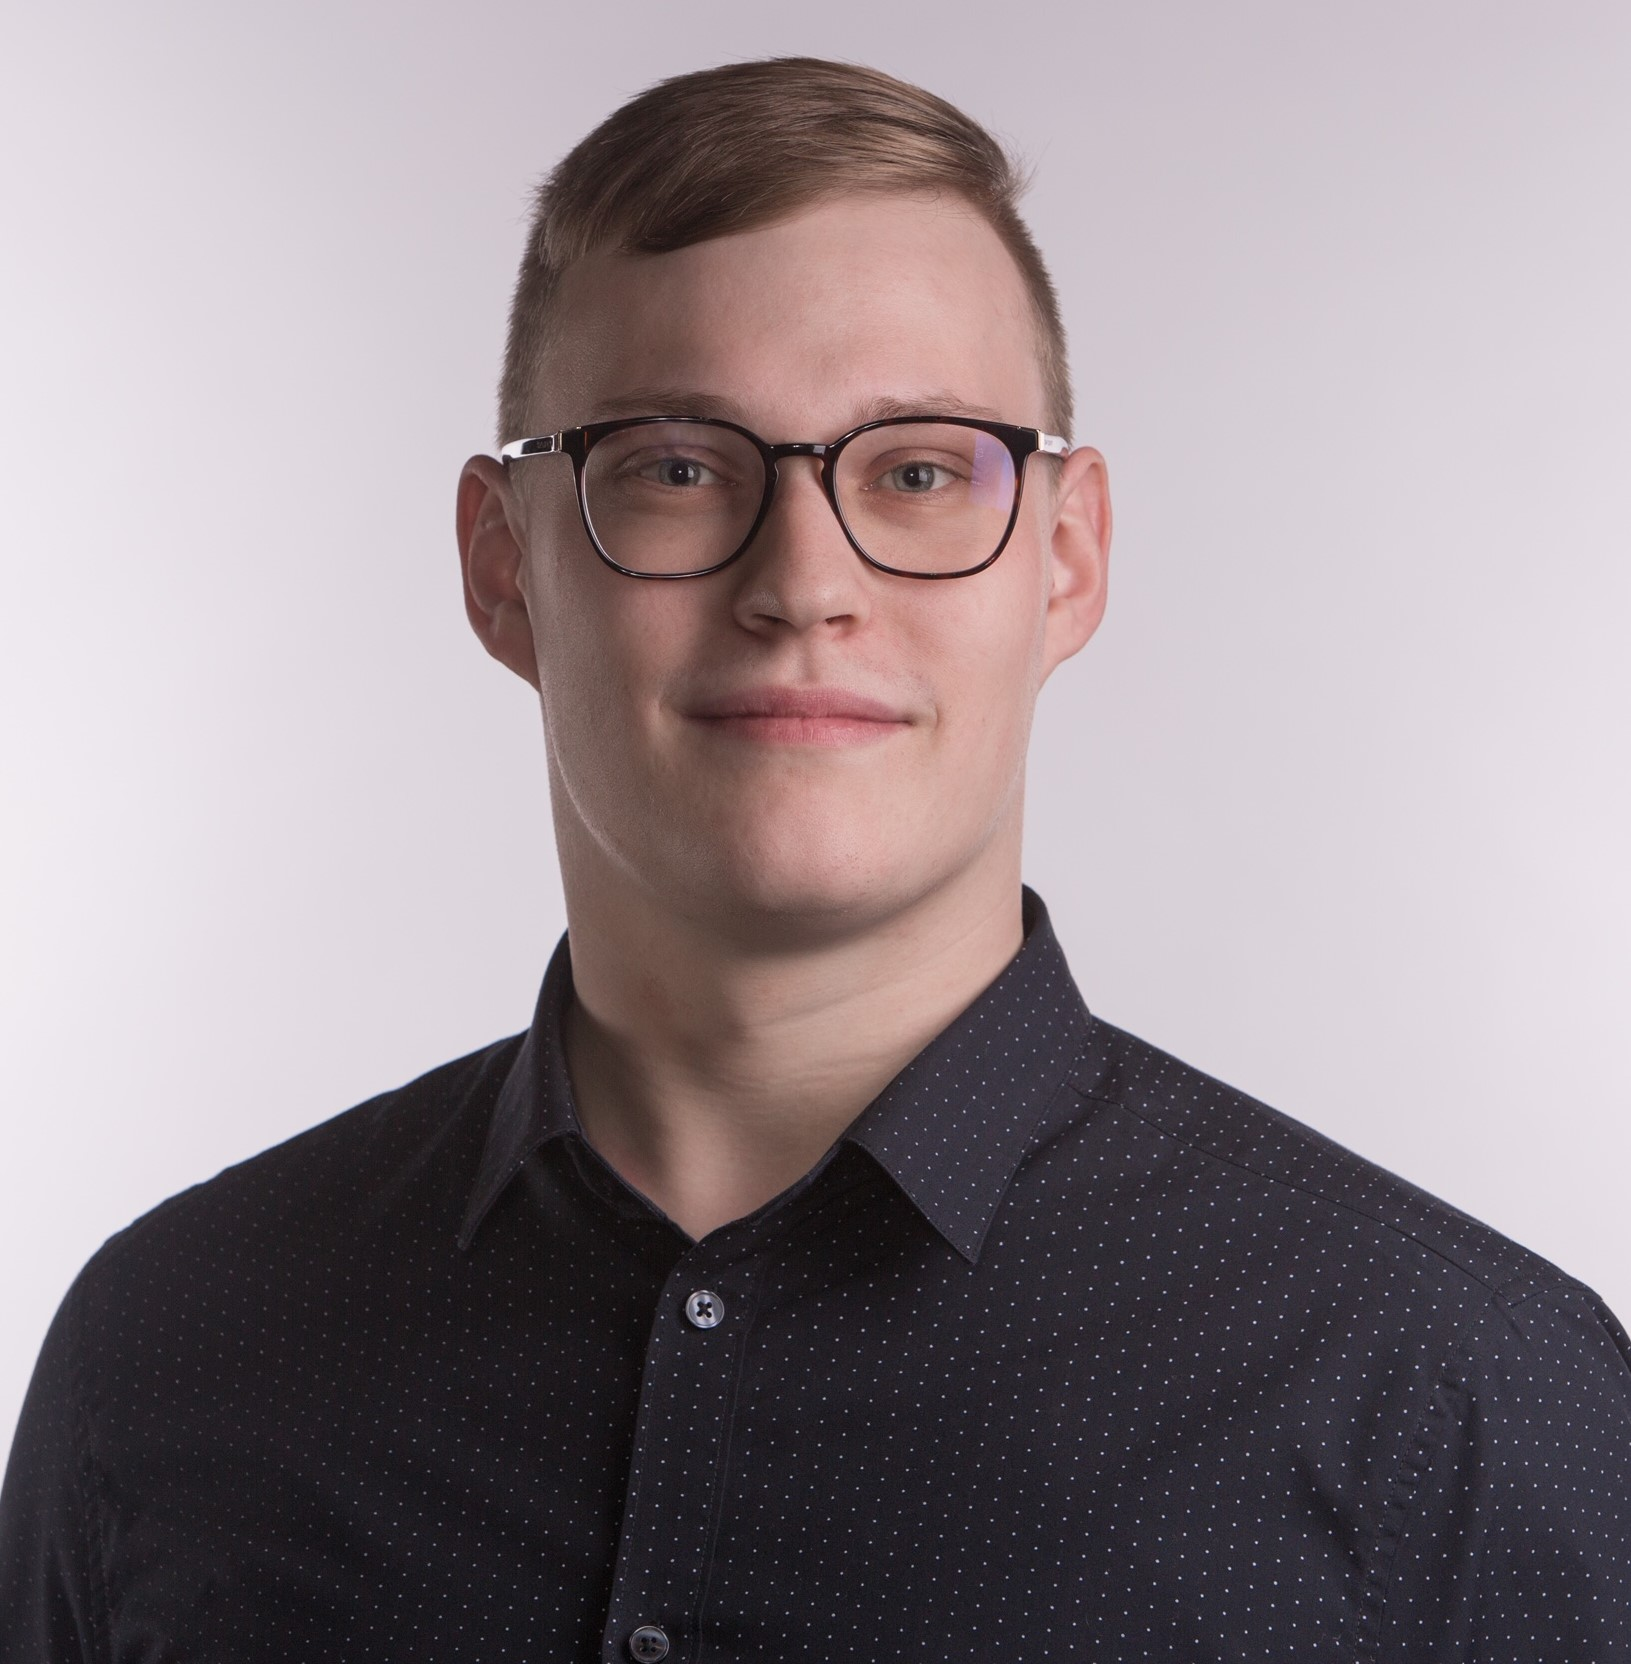 Erik Lauer